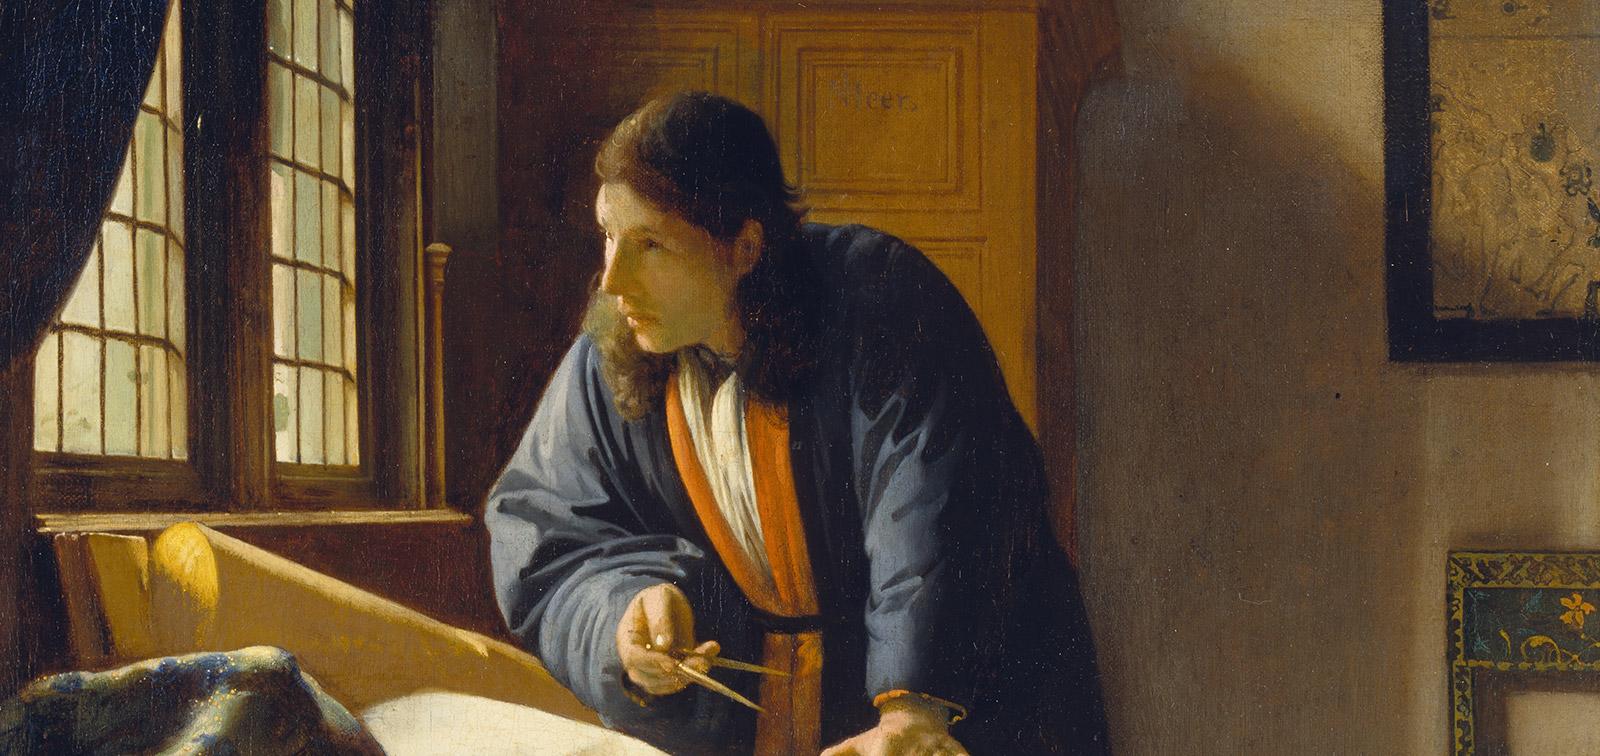 Velázquez, Rembrandt, Vermeer. Miradas afines